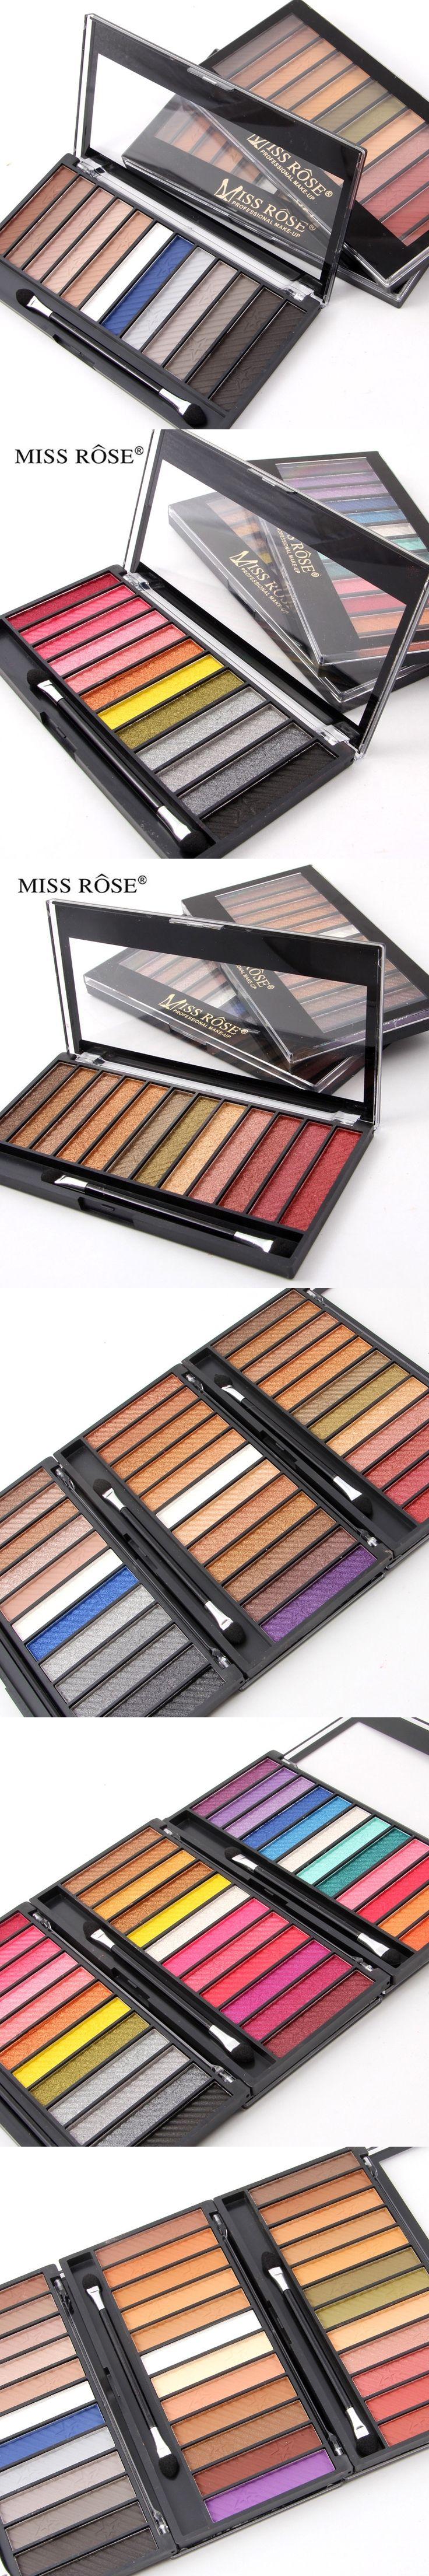 Miss rose 12 colors shimmer&matte eyeshadow palette Easy to Wear Glitter professional beauty eye shadow pallete maquiagem makeup